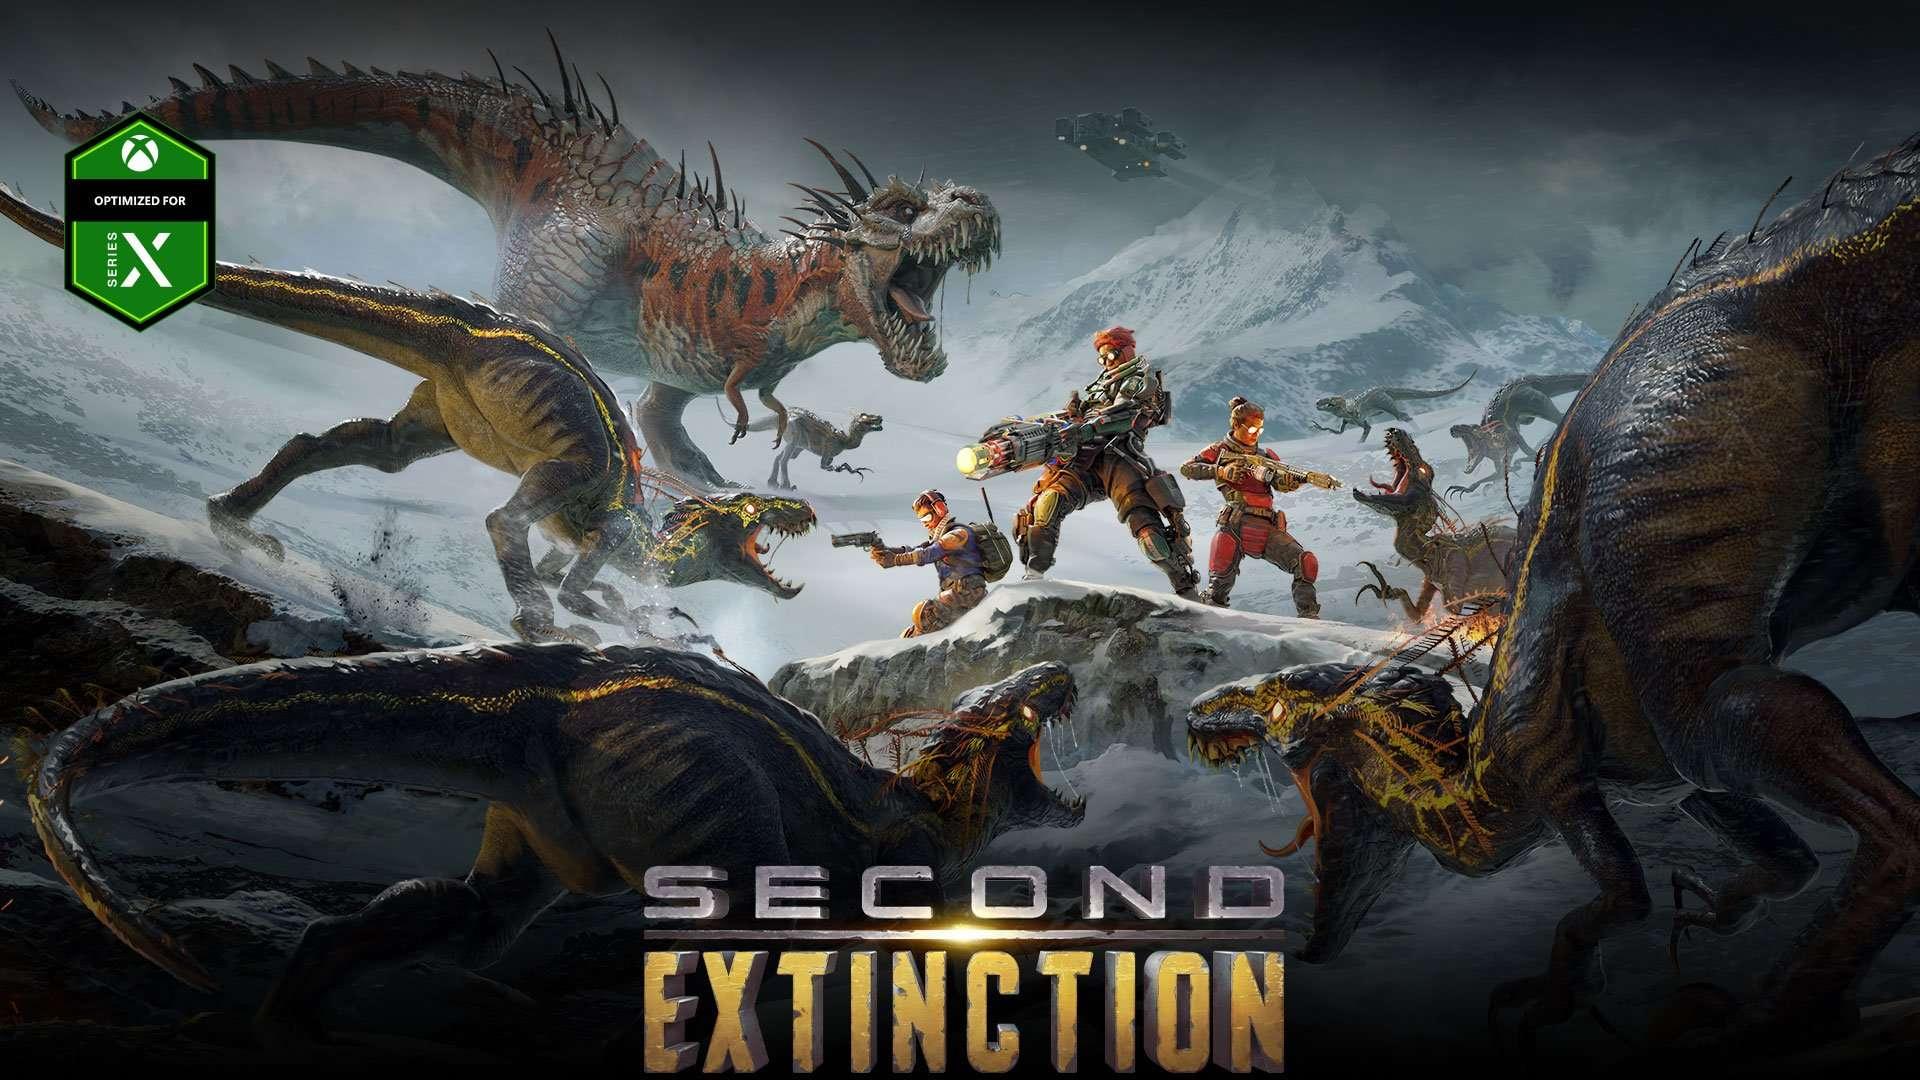 4ea9b037e7c65db8b57fd83db2fa9655 - عرض الكشف عن لعبة Second Extinction لمنصة Xbox